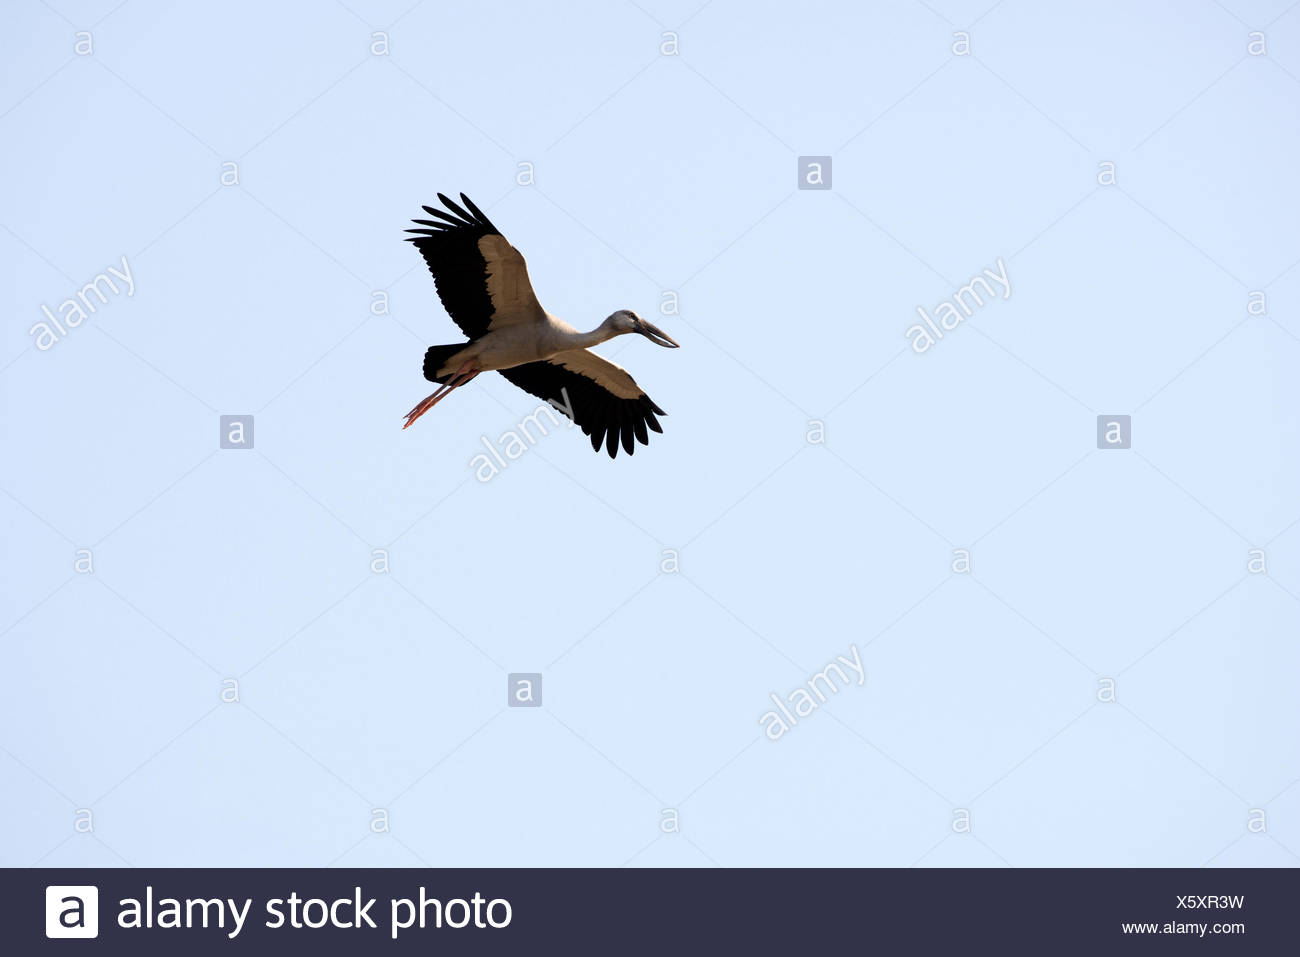 Asiatischer Openbill, fliegen, Thailand, Bec, Ouvert Indien, Vogel, Wader, Anastomus Oscitans, Flug Stockbild